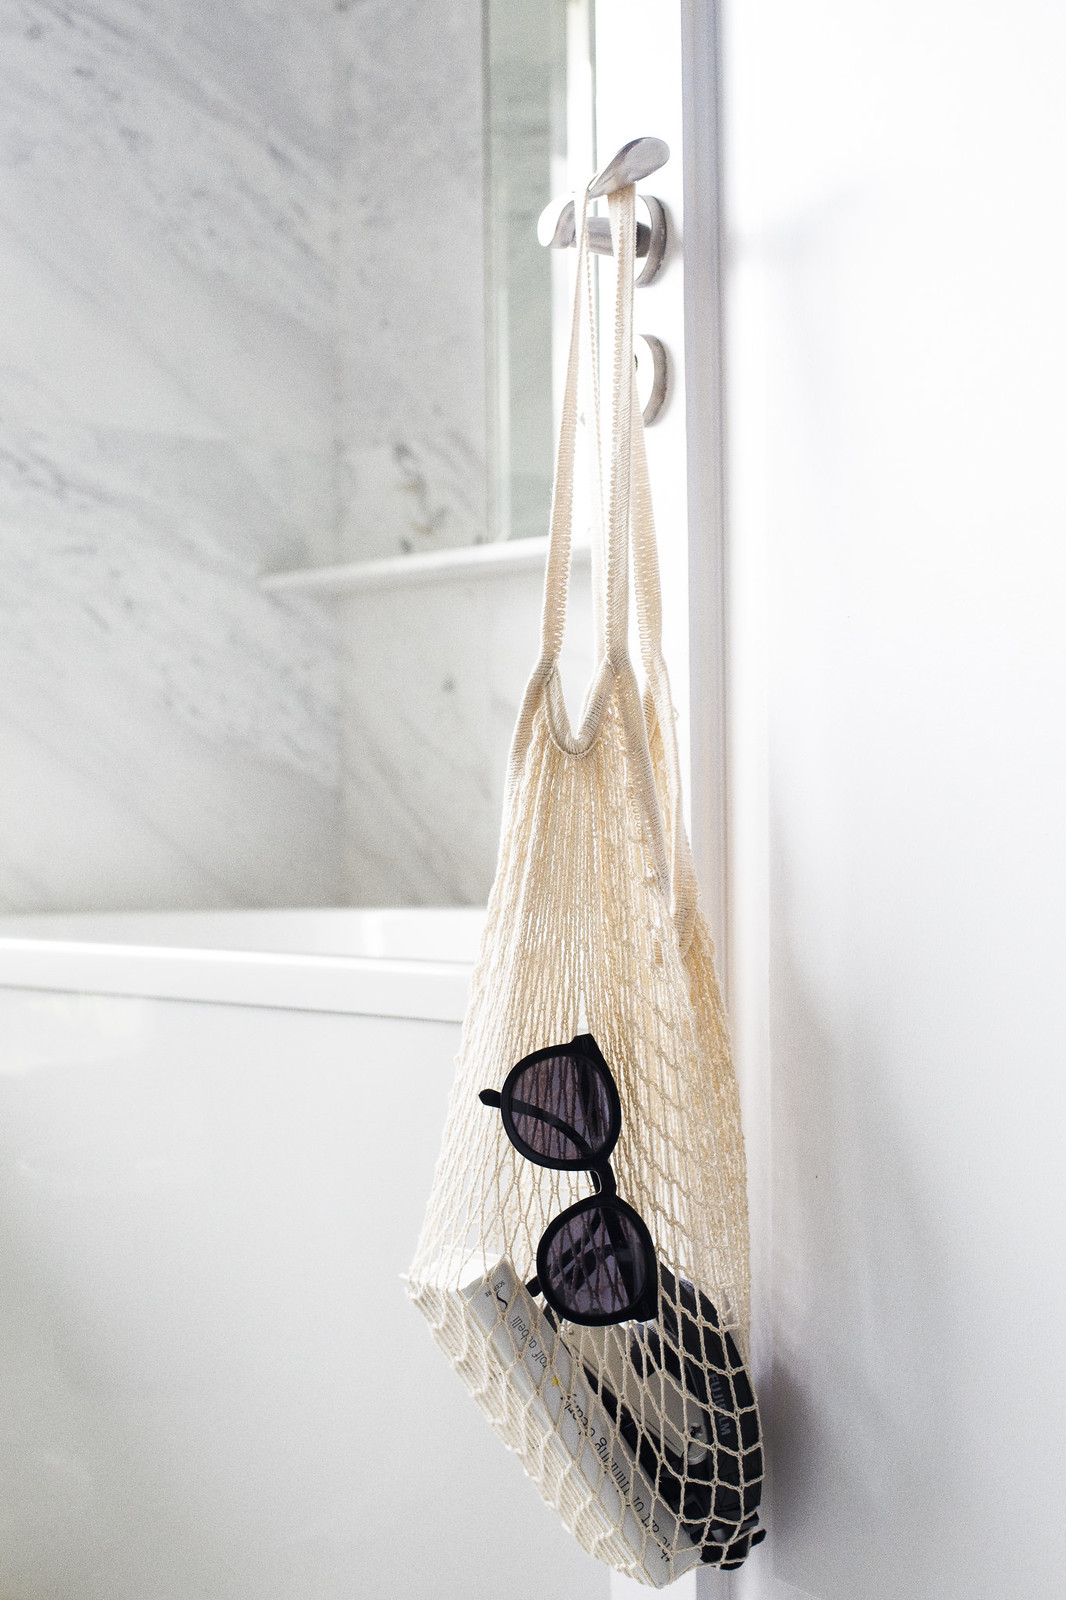 The summer piece, Fishnet Bag